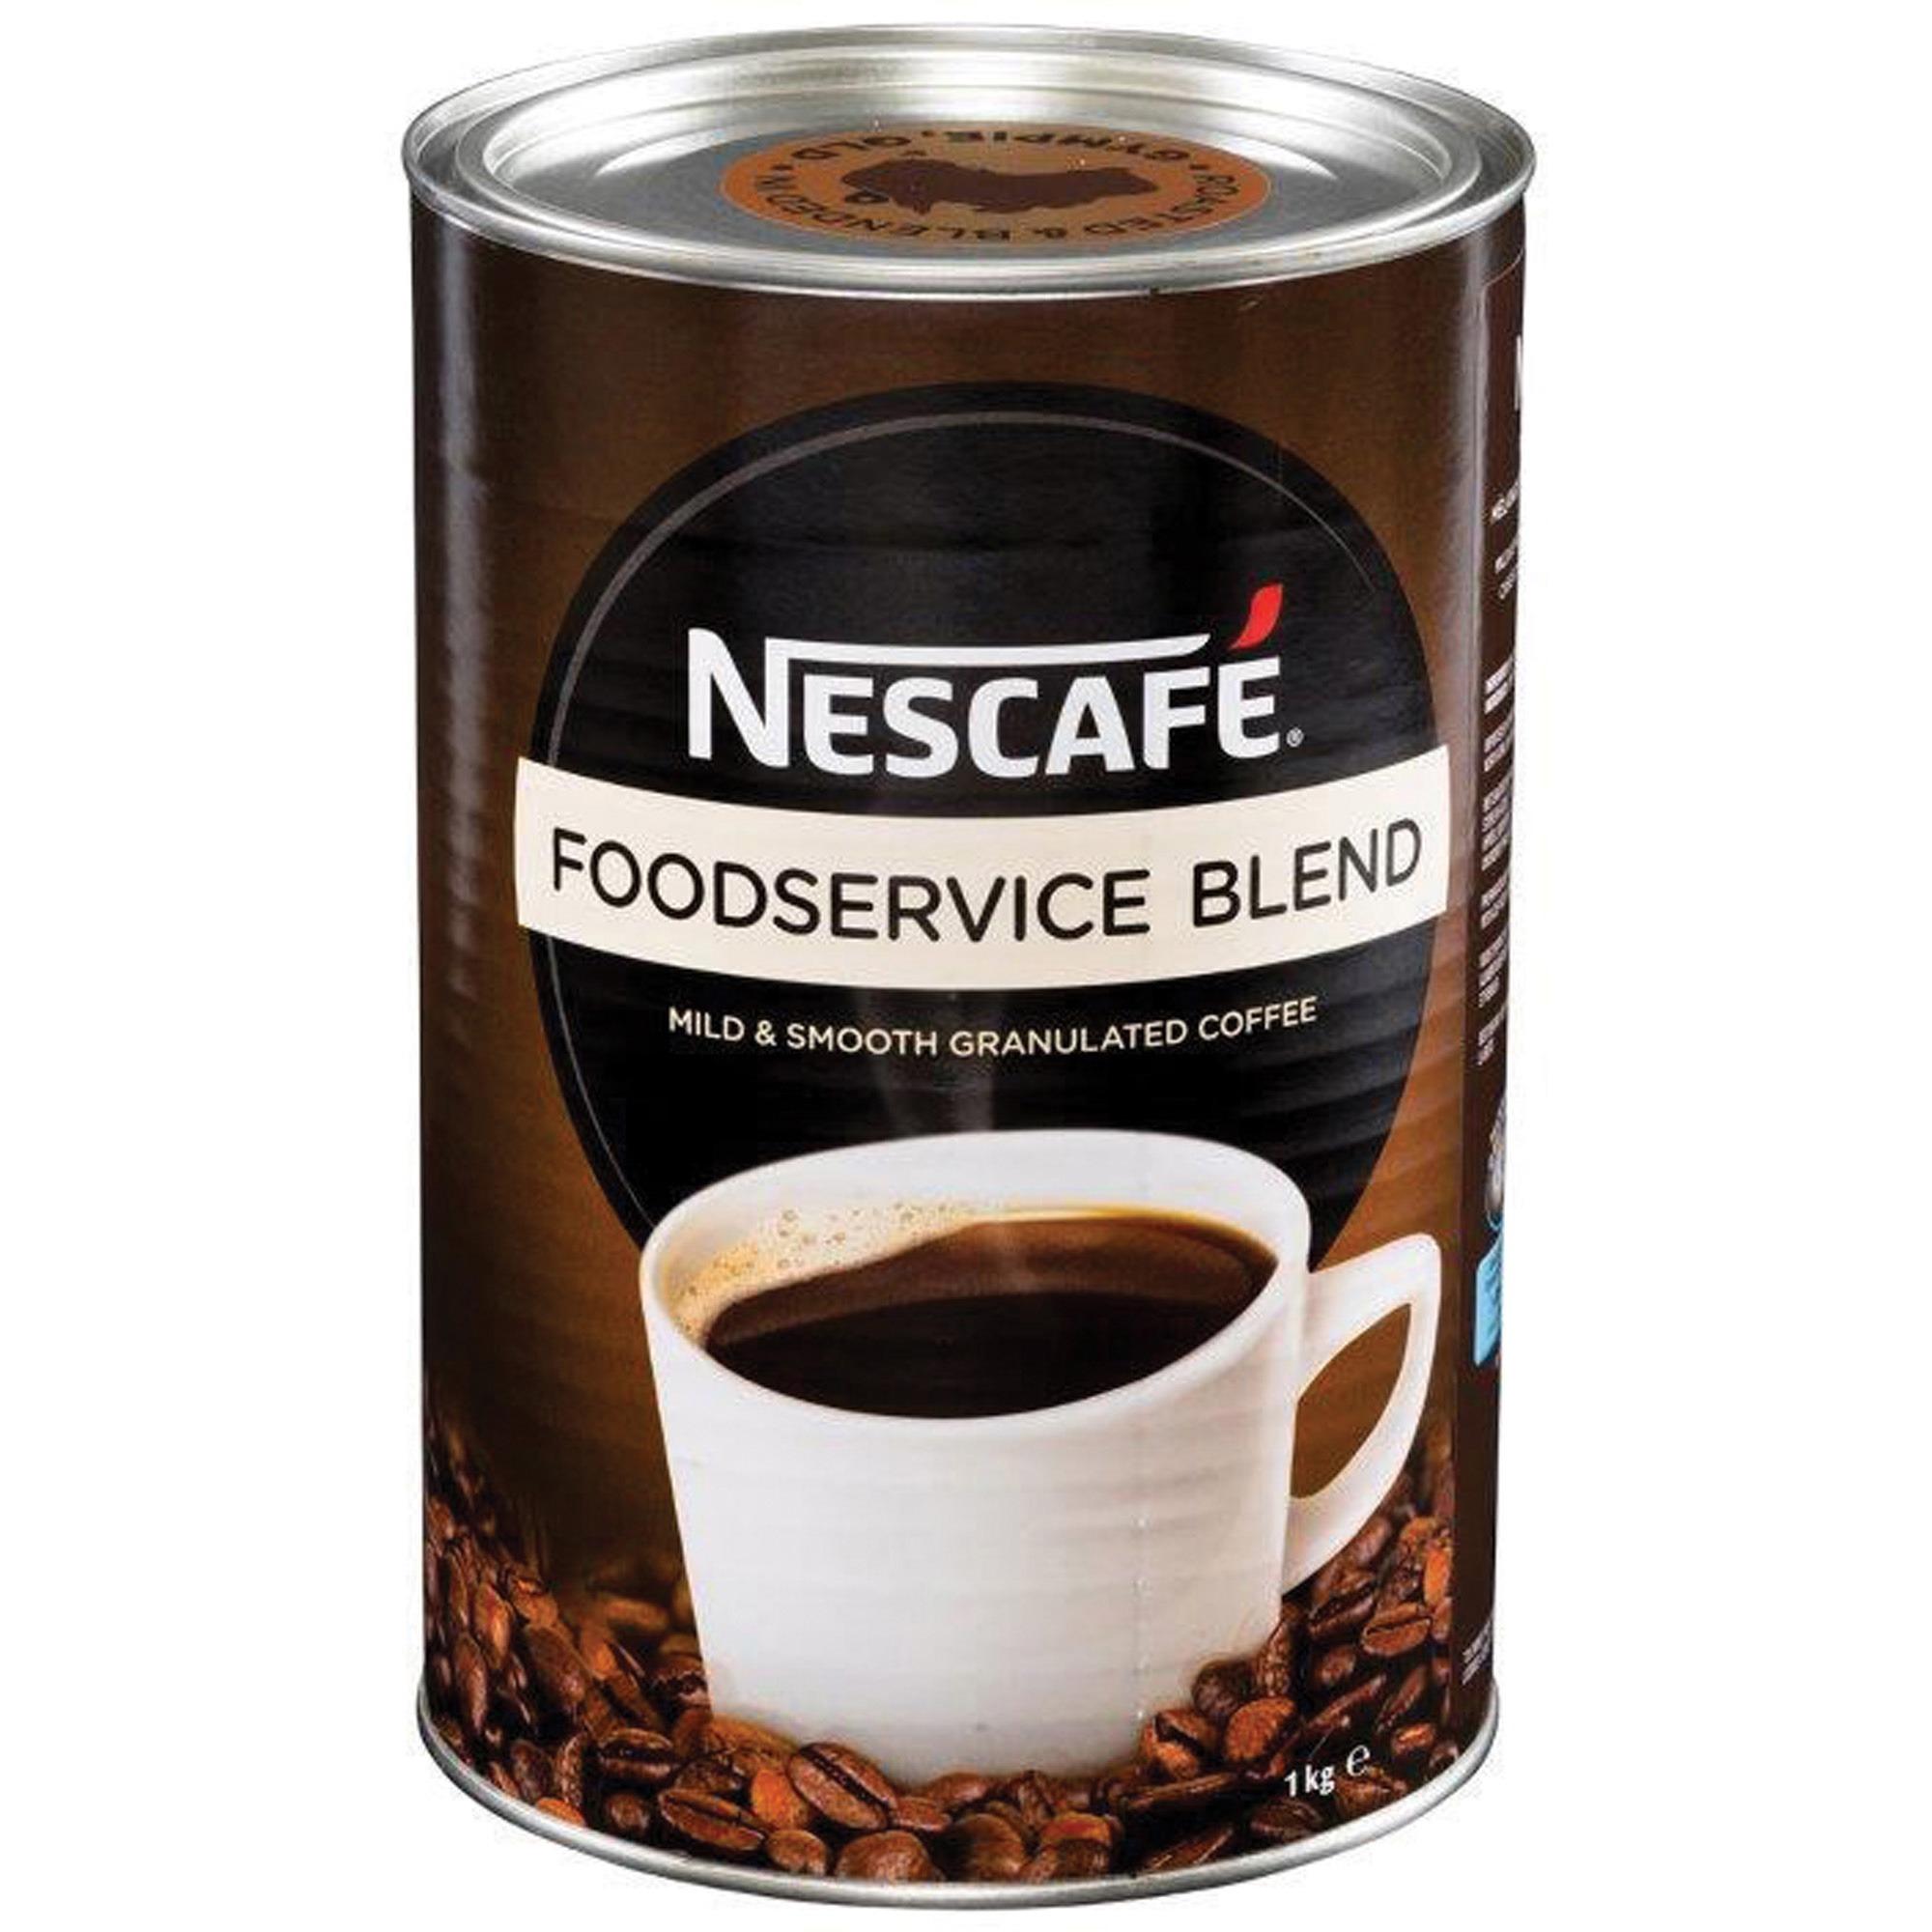 Nestle Professional Nescafe Foodservice Blend Coffee - 35.3 oz - 1 Each